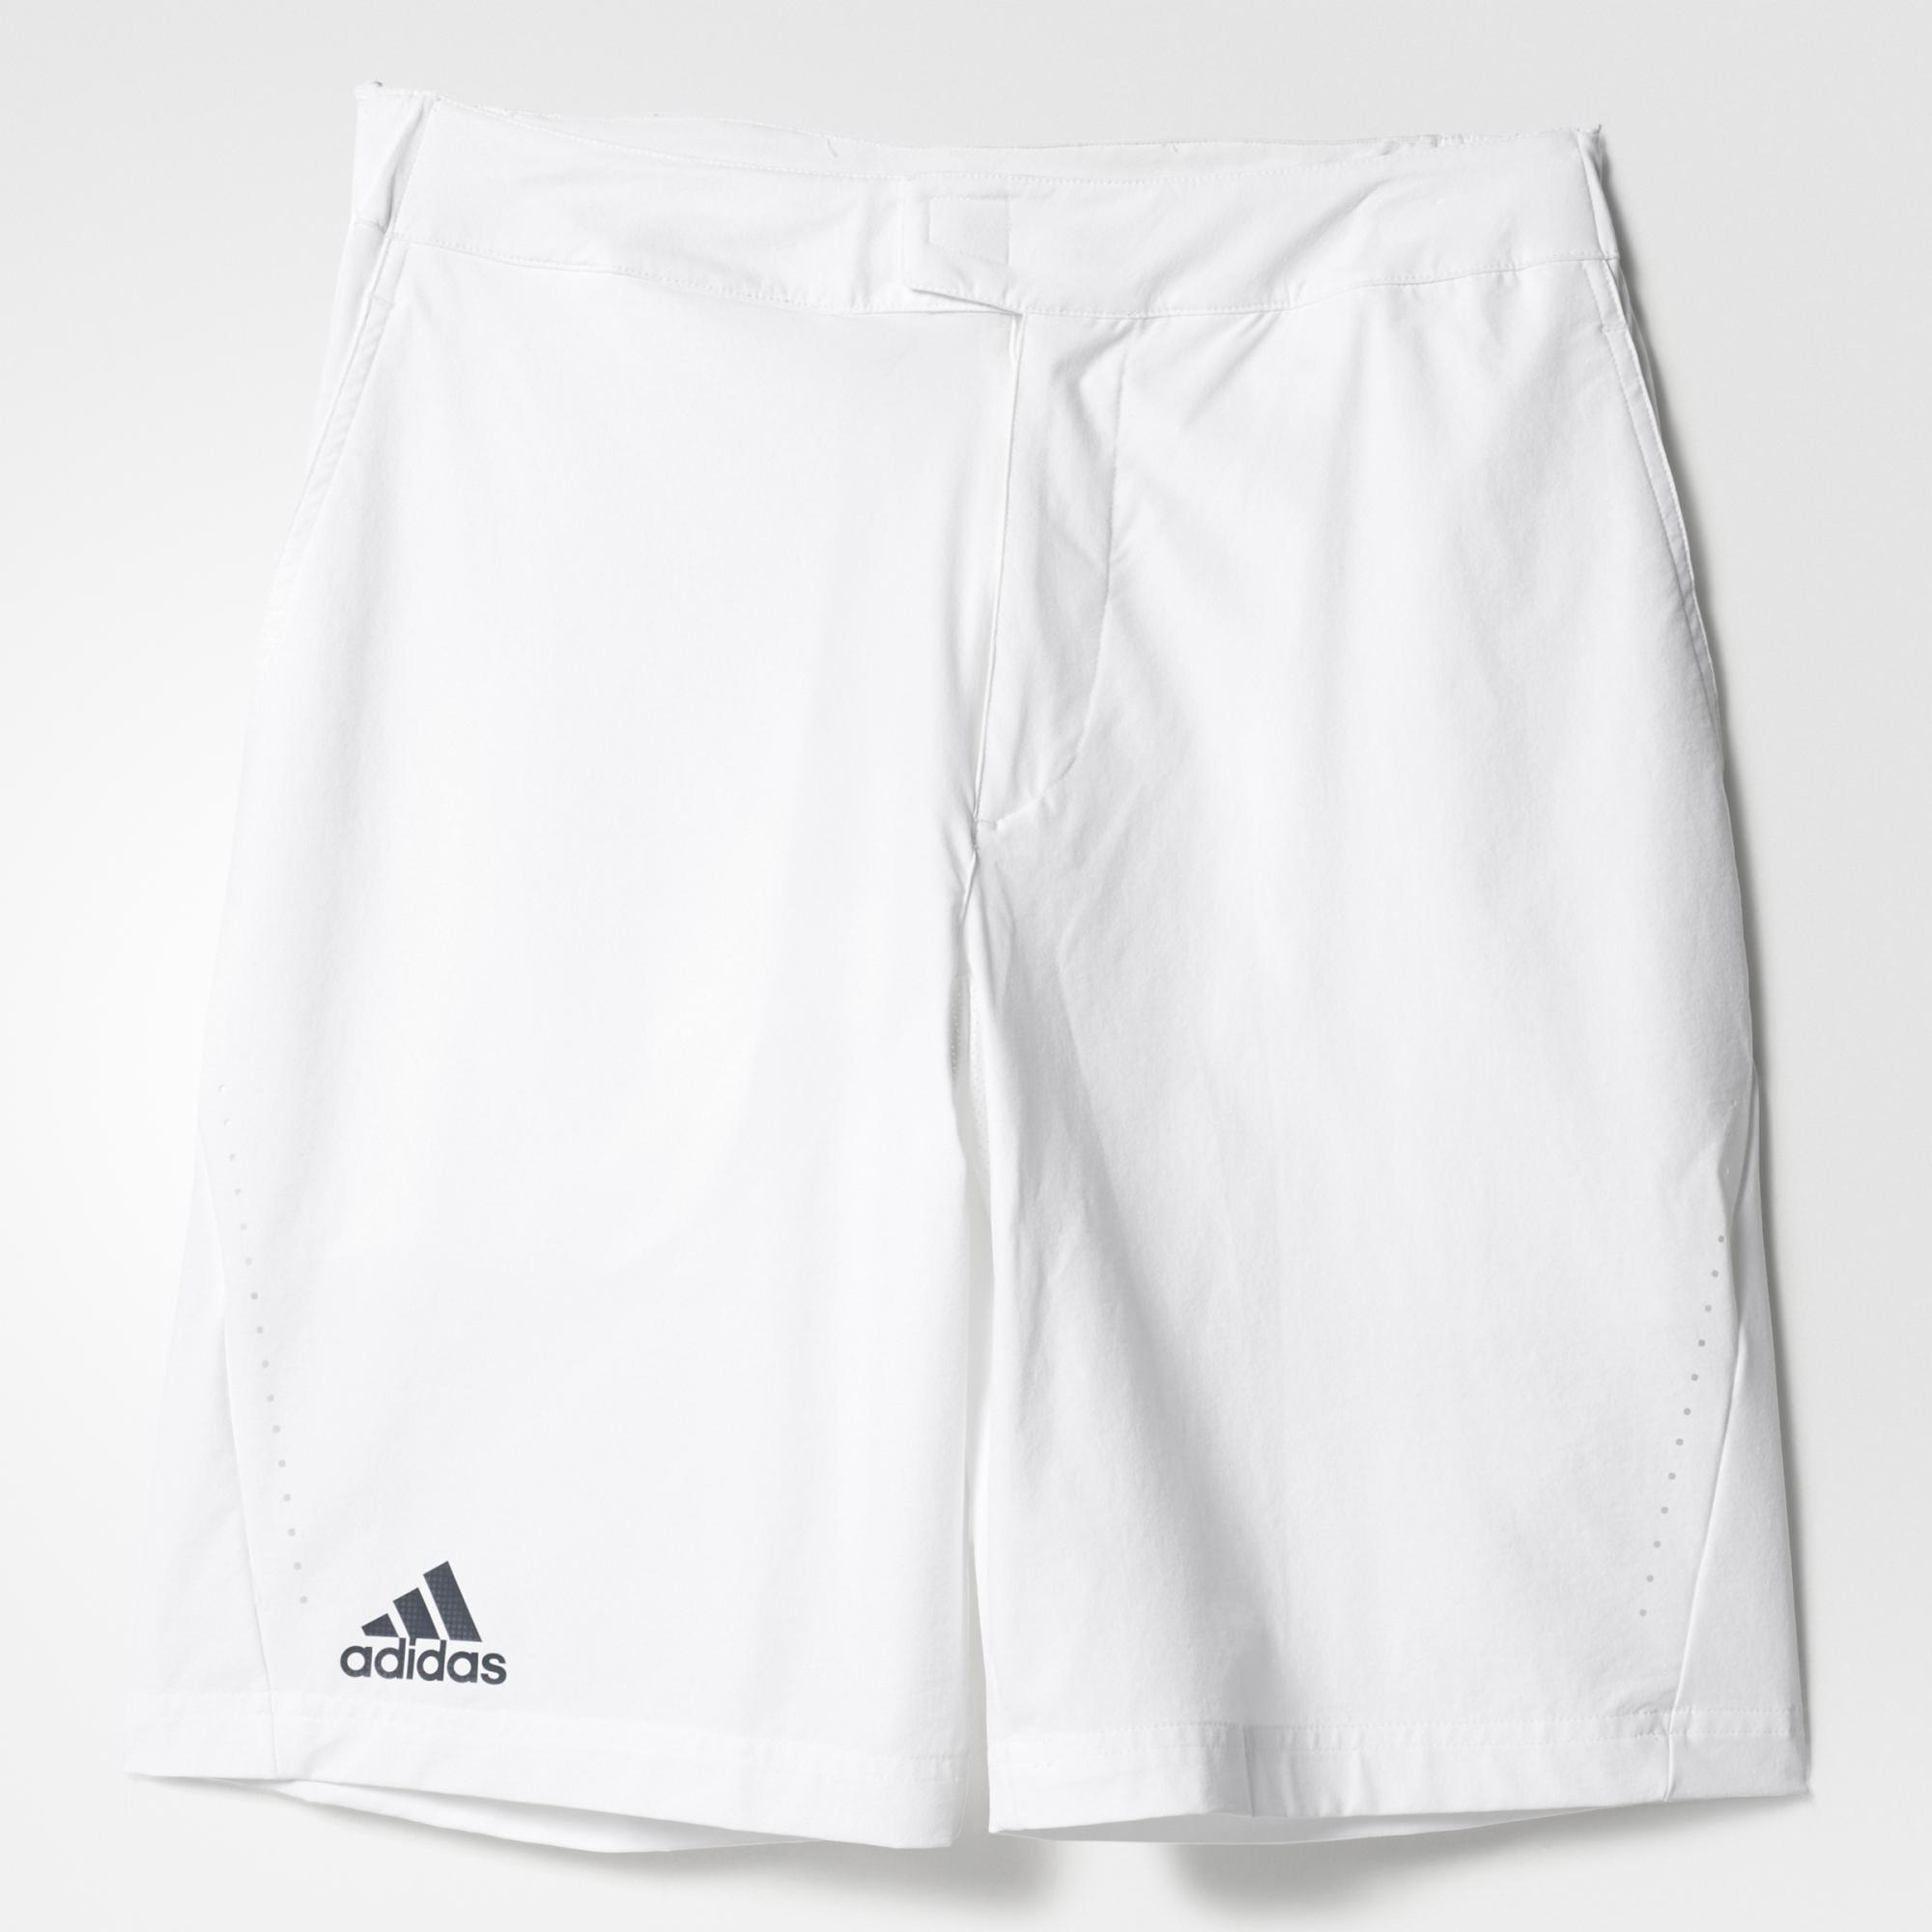 adidas tennis shorts